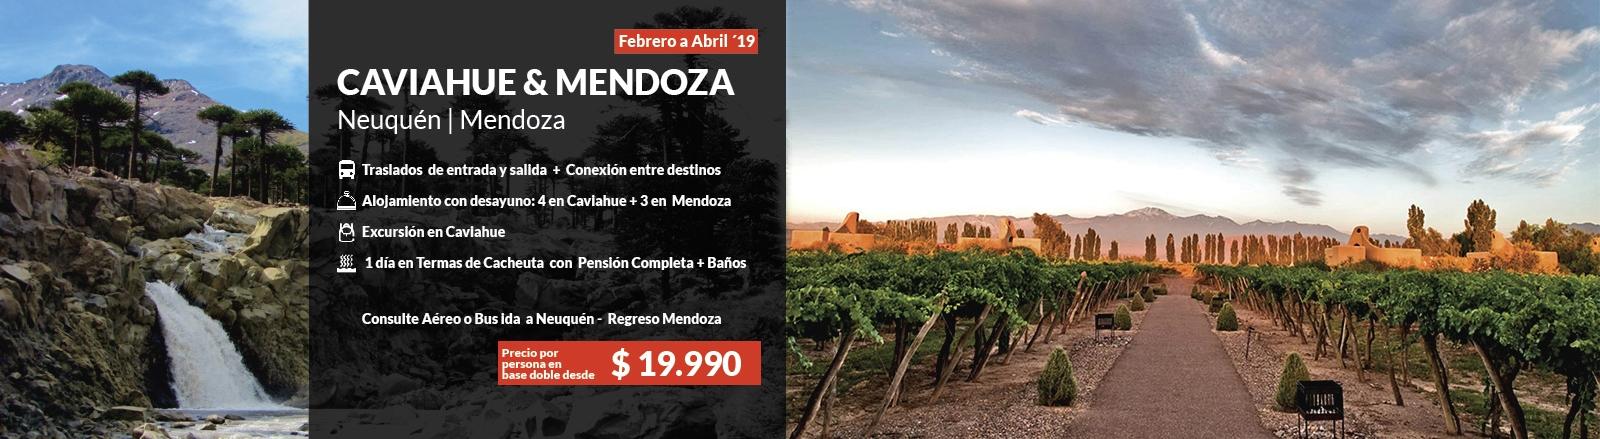 Caviahue & Mendoza